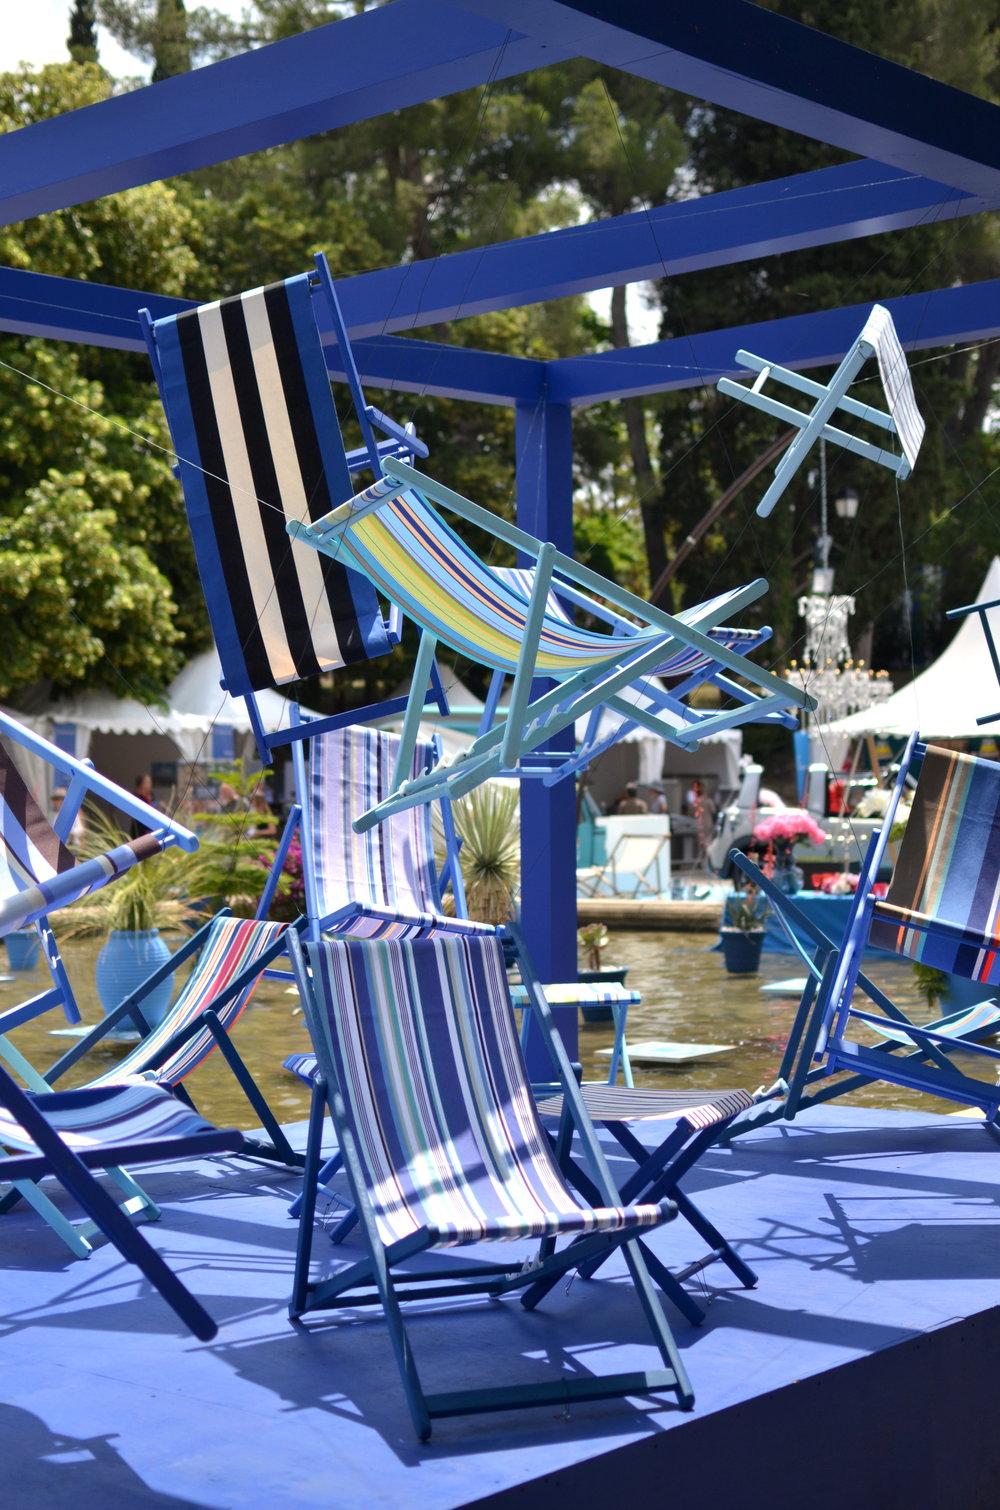 twinky lizzy blog aix en provence - cote sud 2017 14.jpg